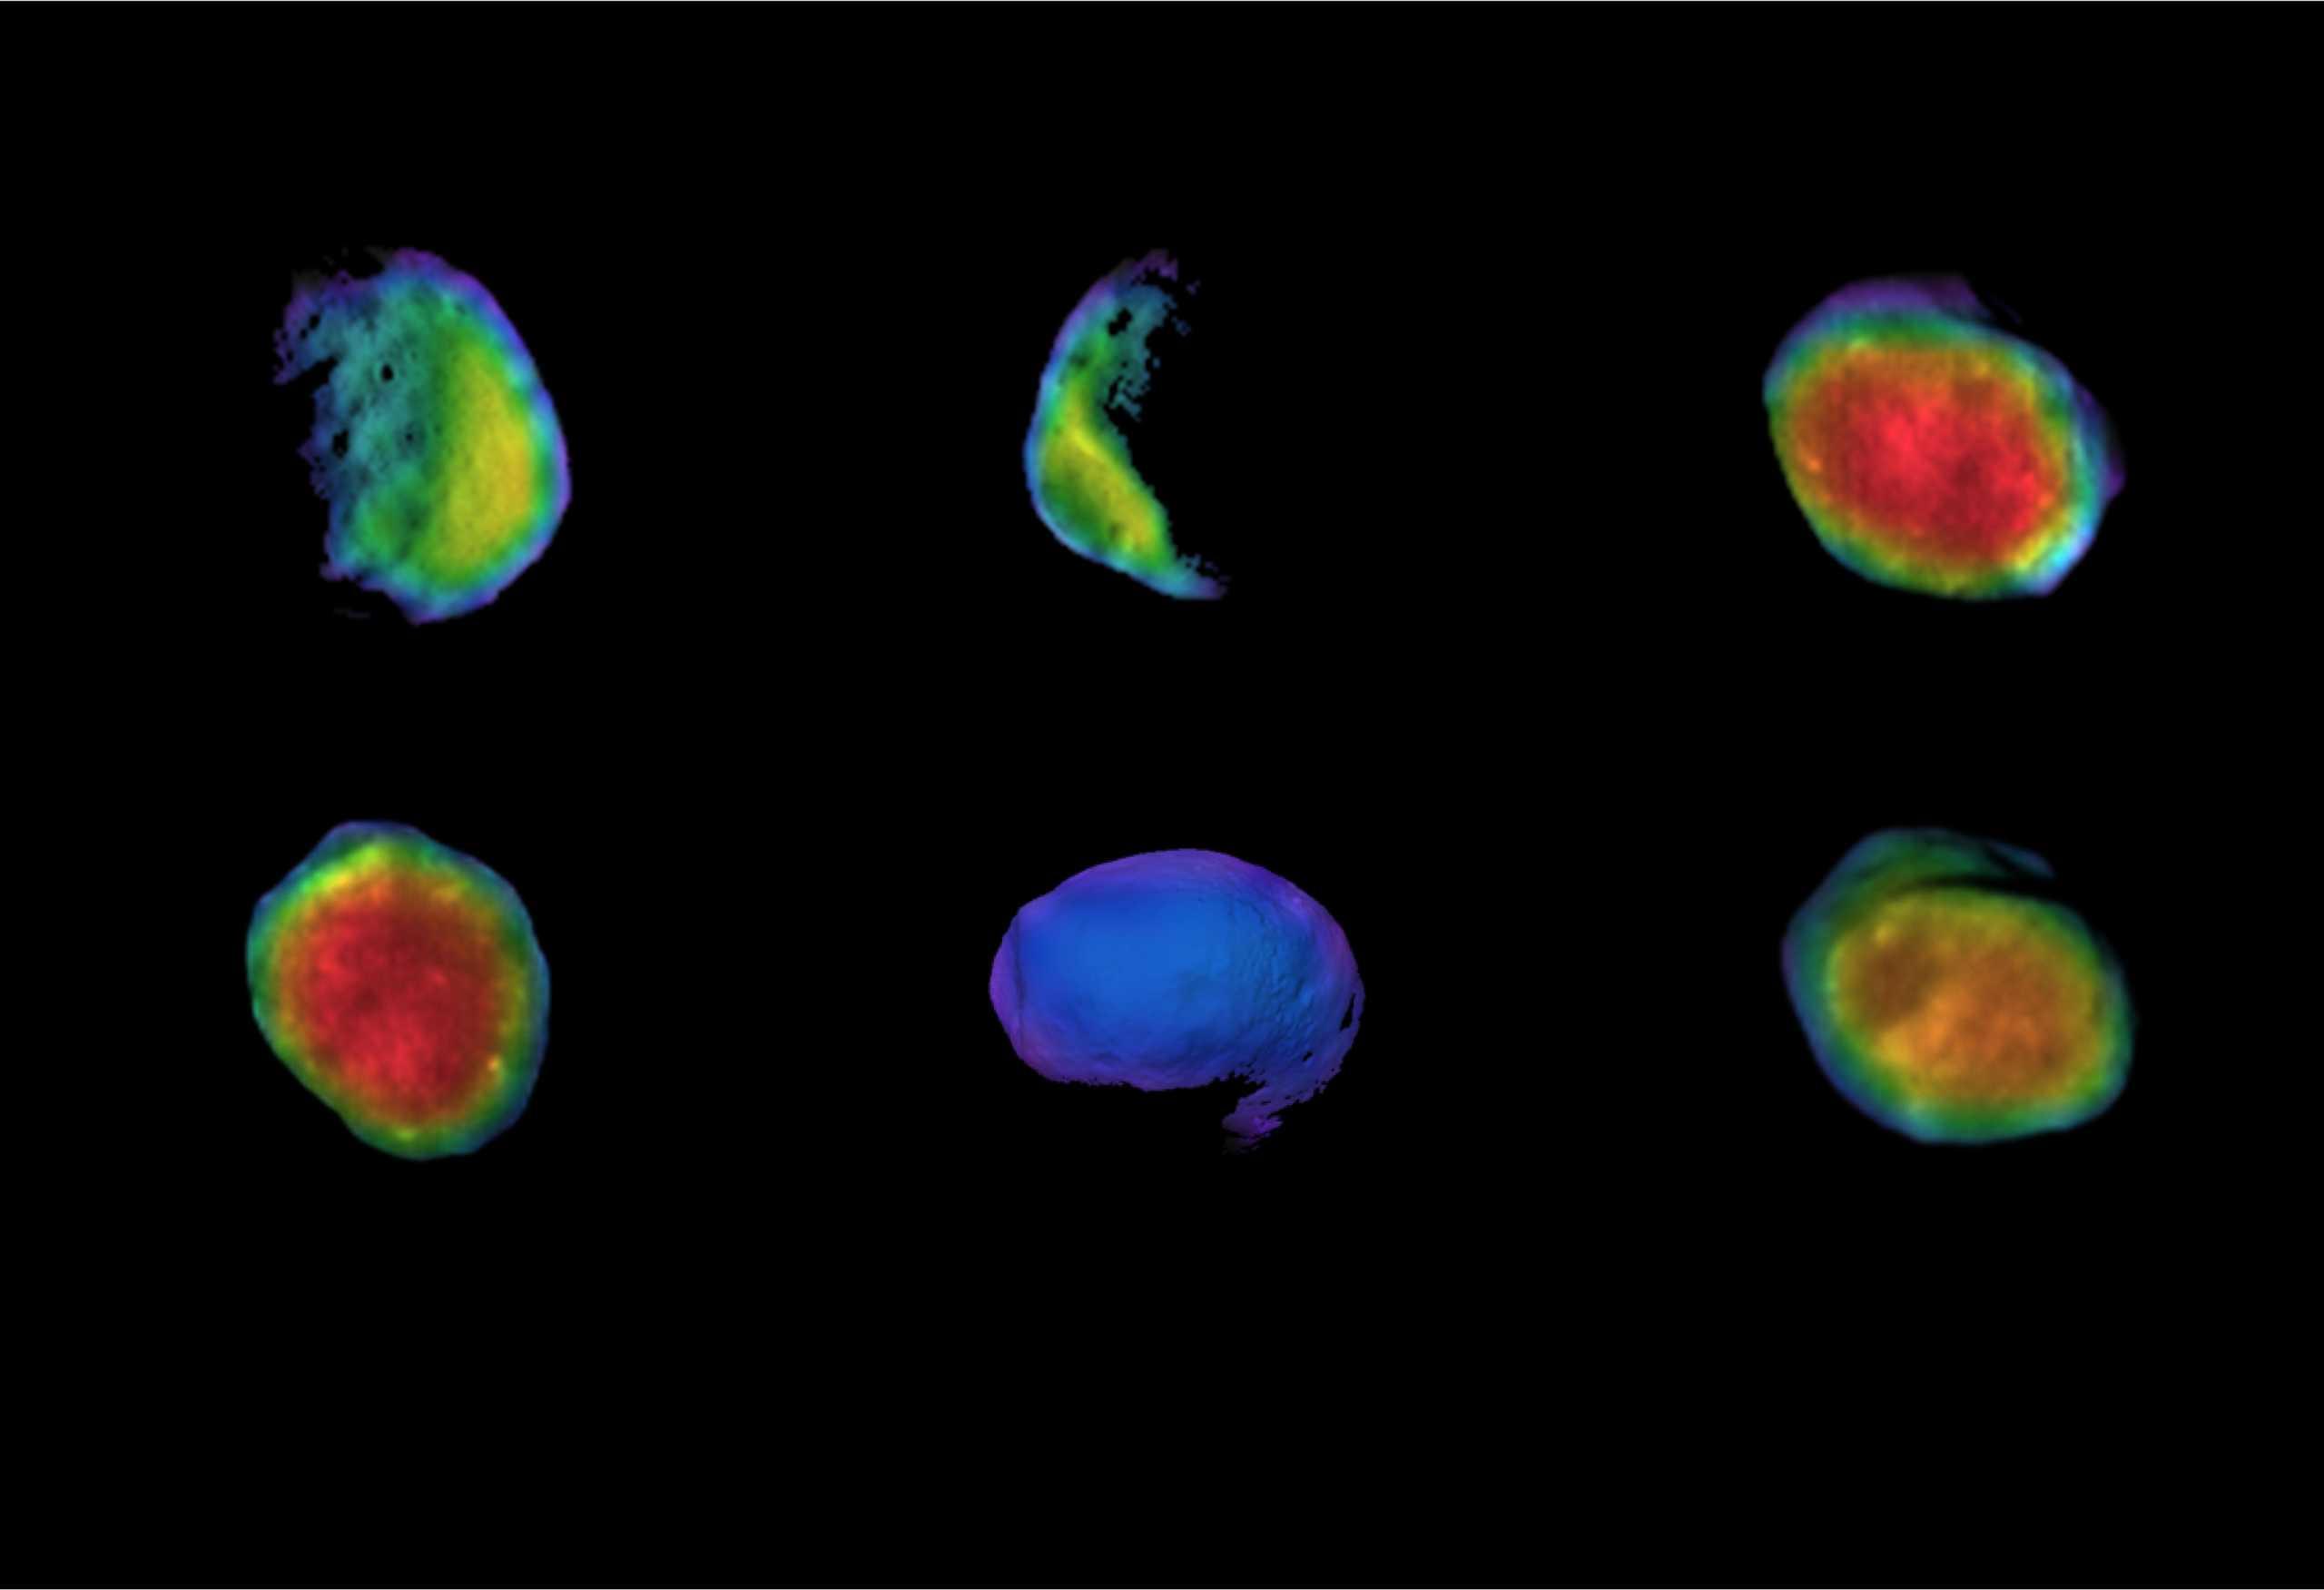 planeta Marte phobos termal